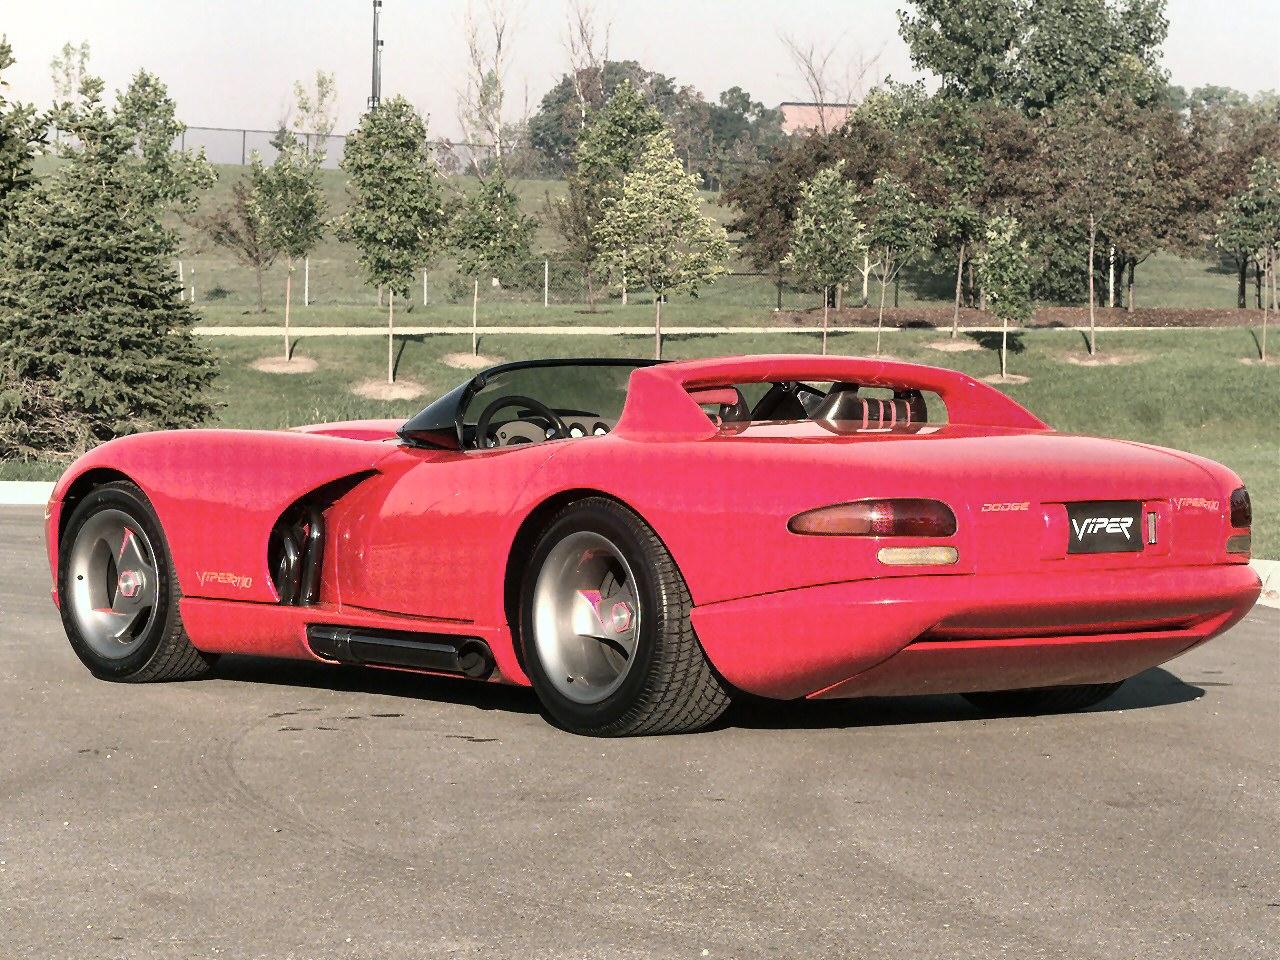 39 89 dodge viper rt 10 concept just look at those rear wheels. Black Bedroom Furniture Sets. Home Design Ideas